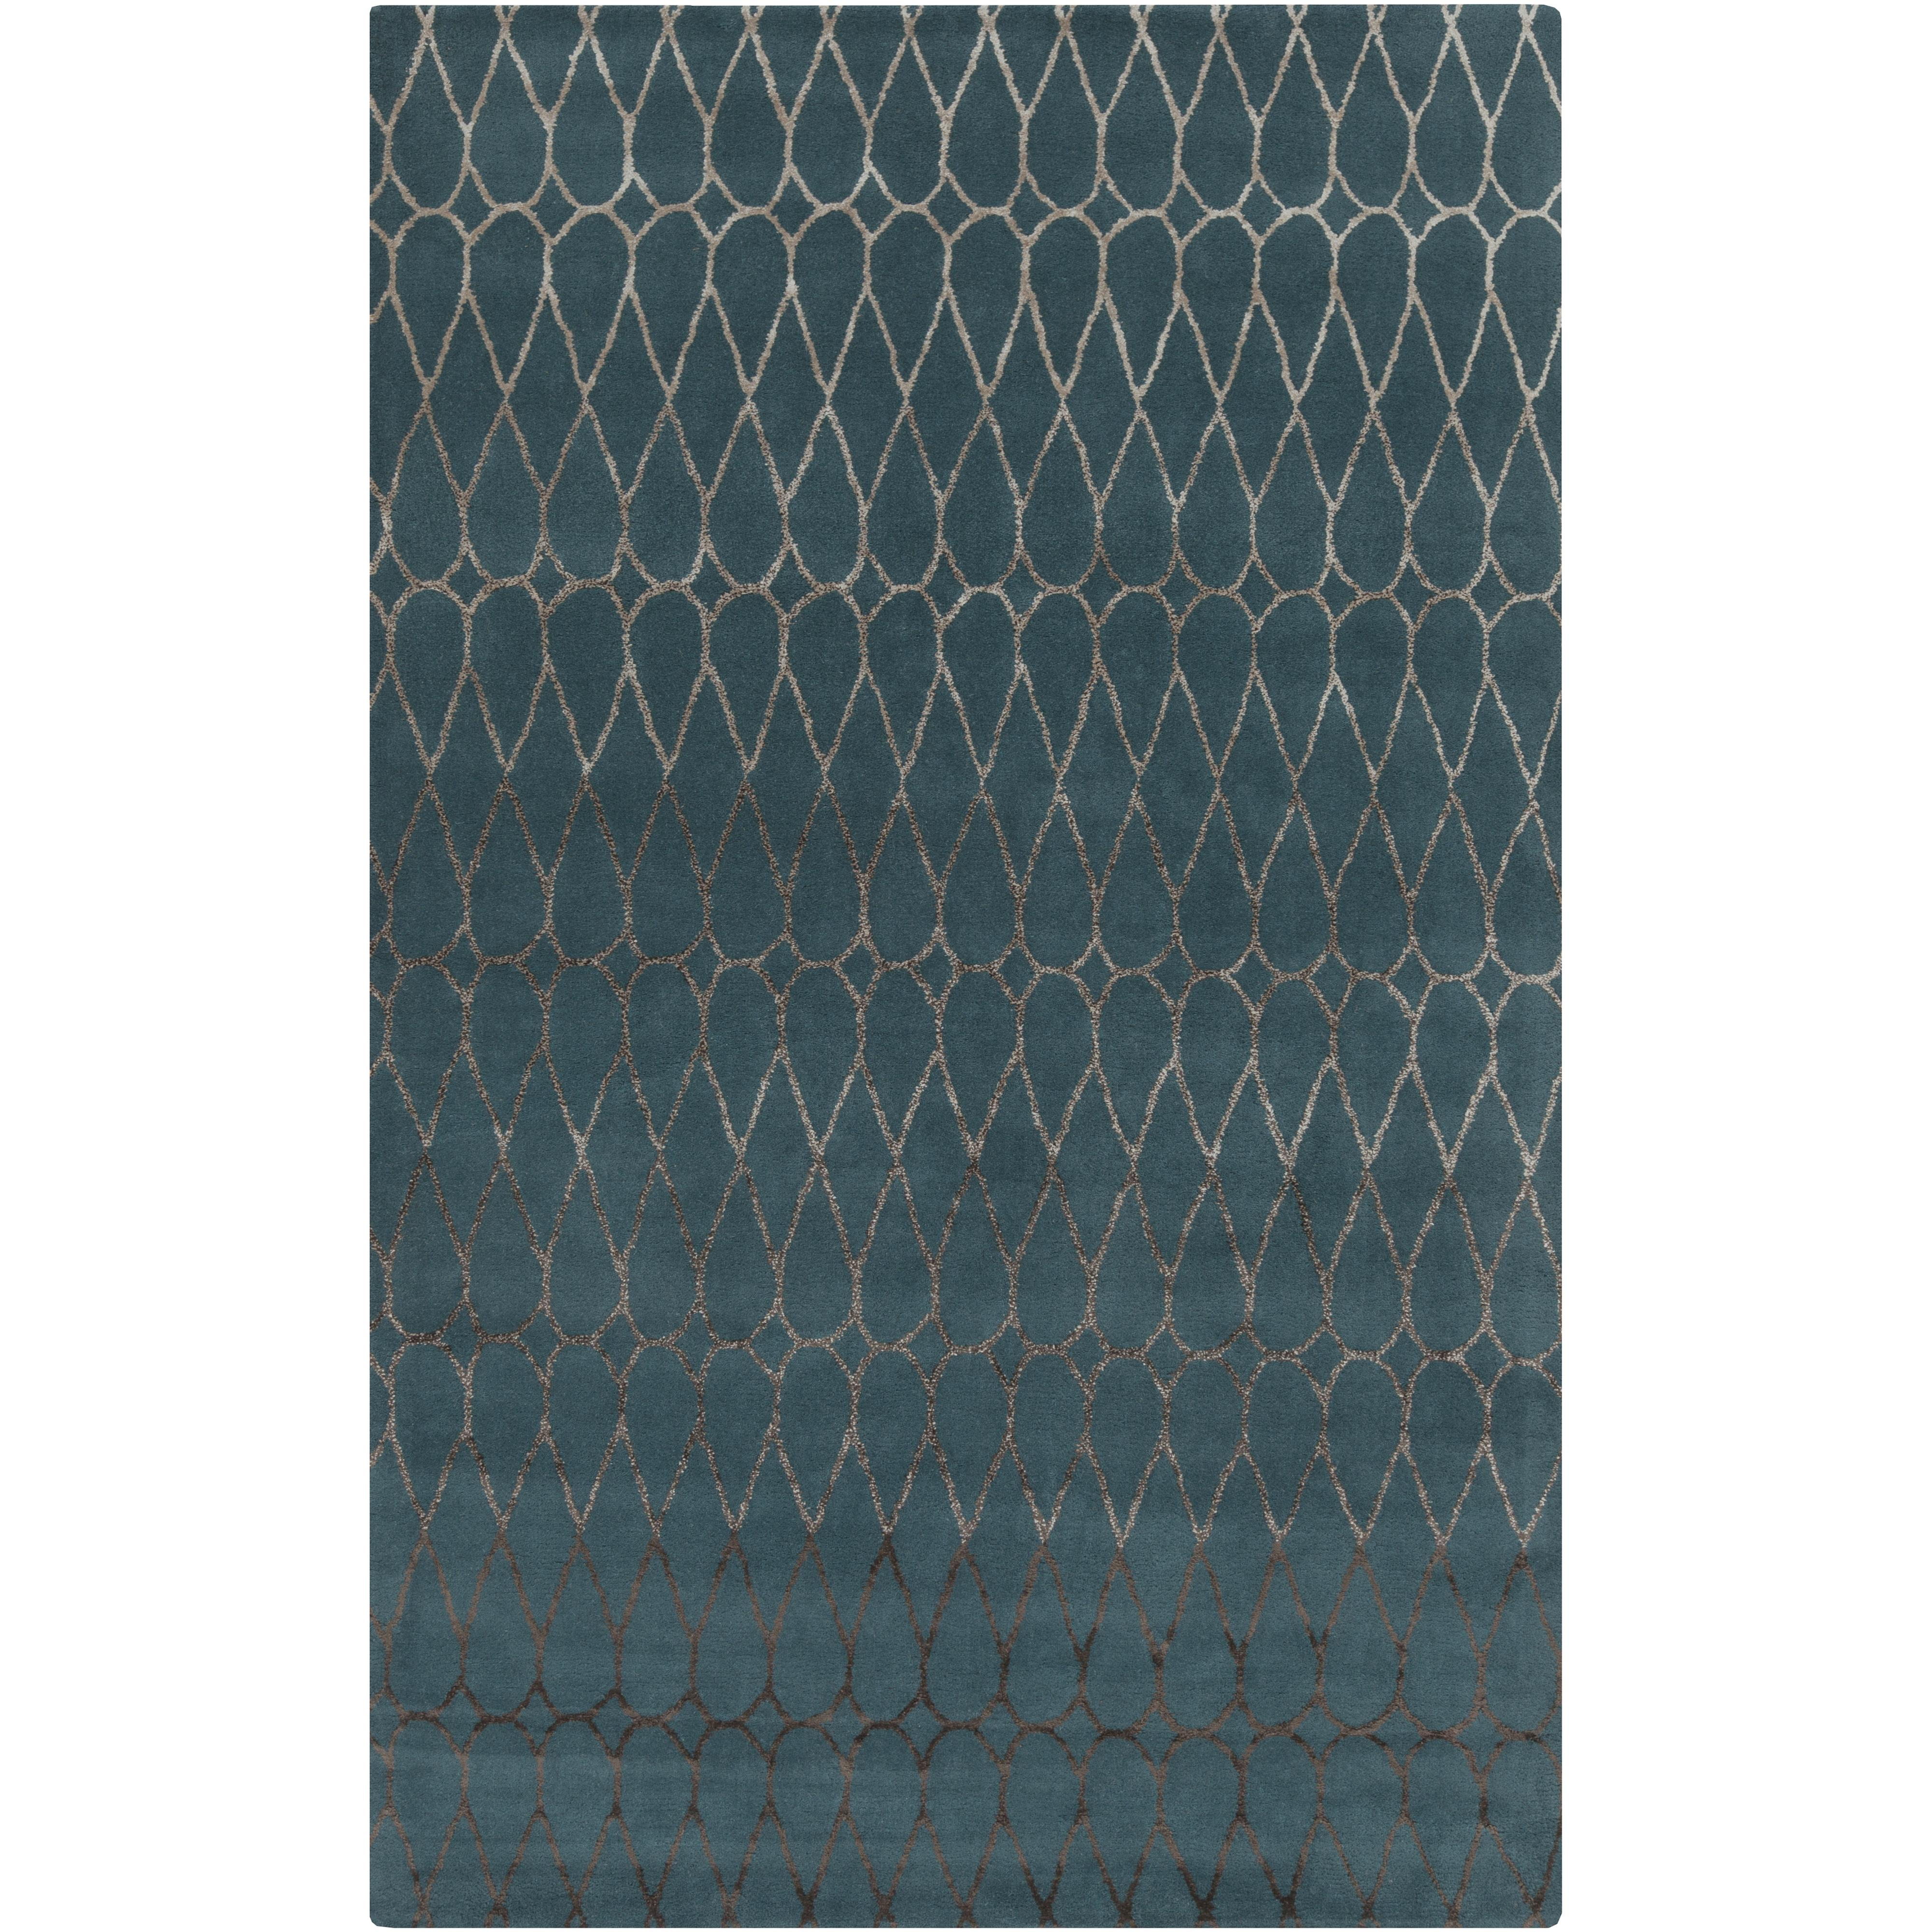 Surya Rugs Naya 5' x 8' - Item Number: NY5246-58